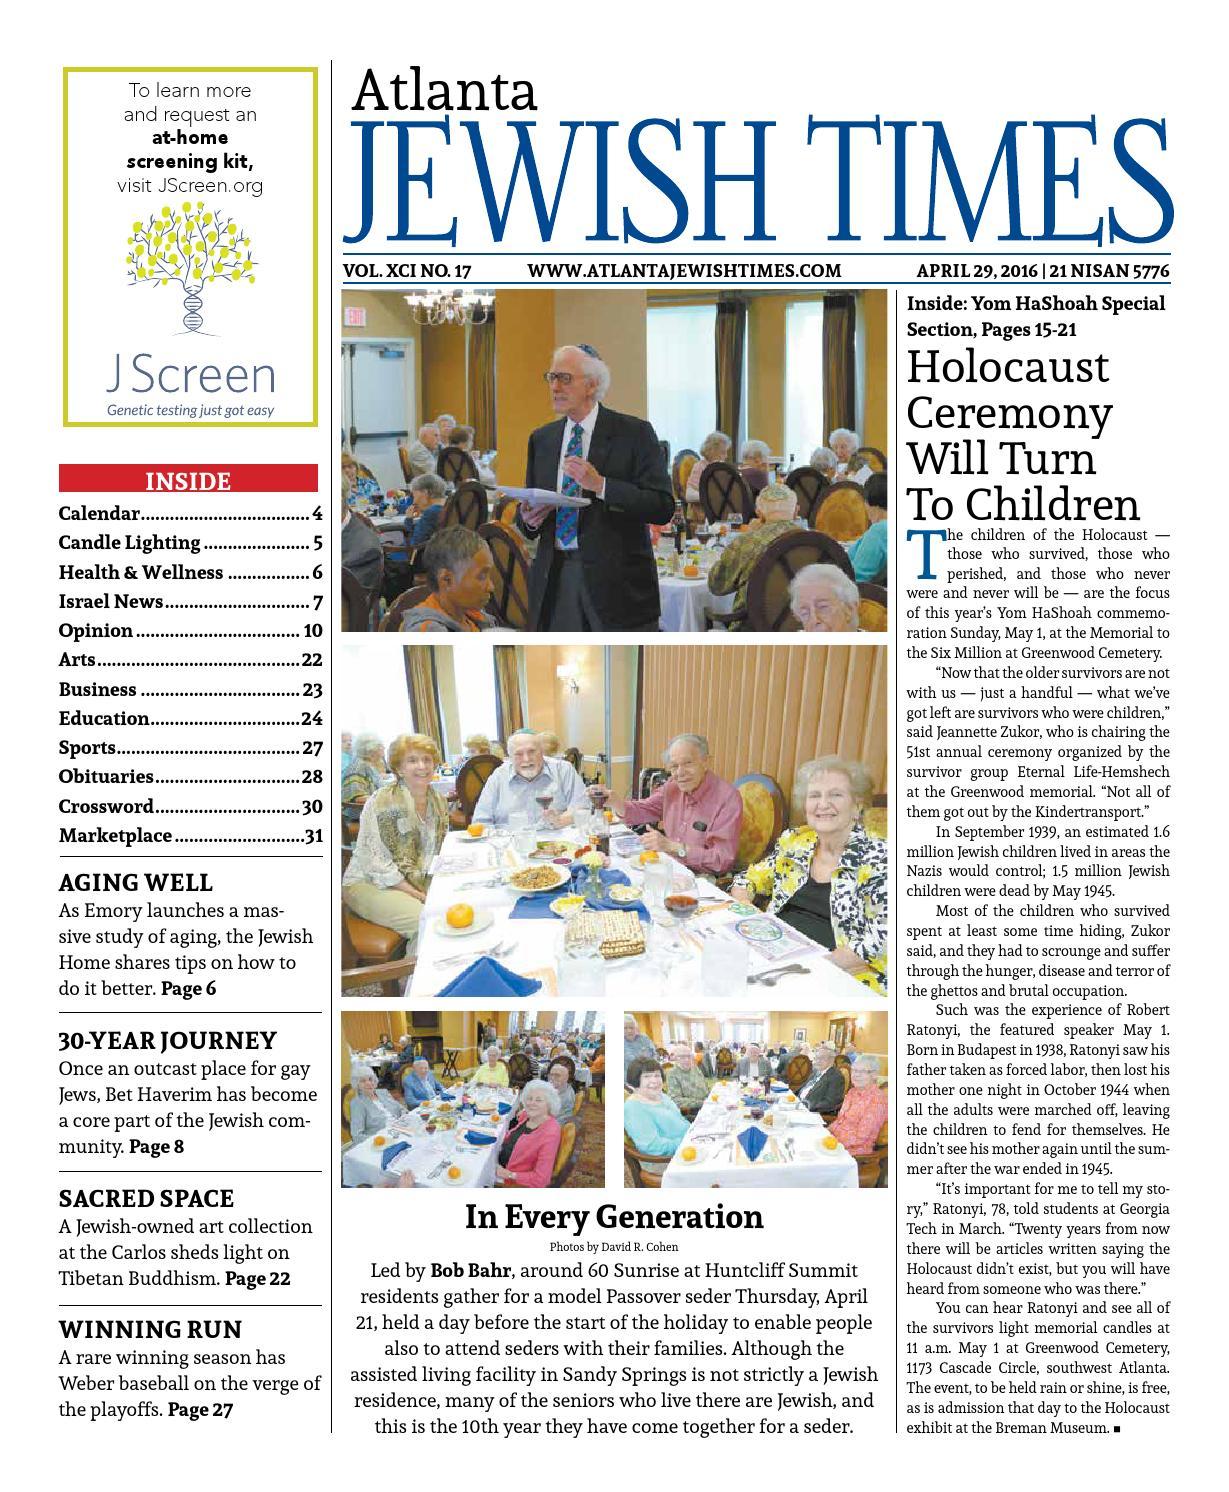 Atlanta Jewish Times, Vol  XCI No  17, April 29, 2016 by